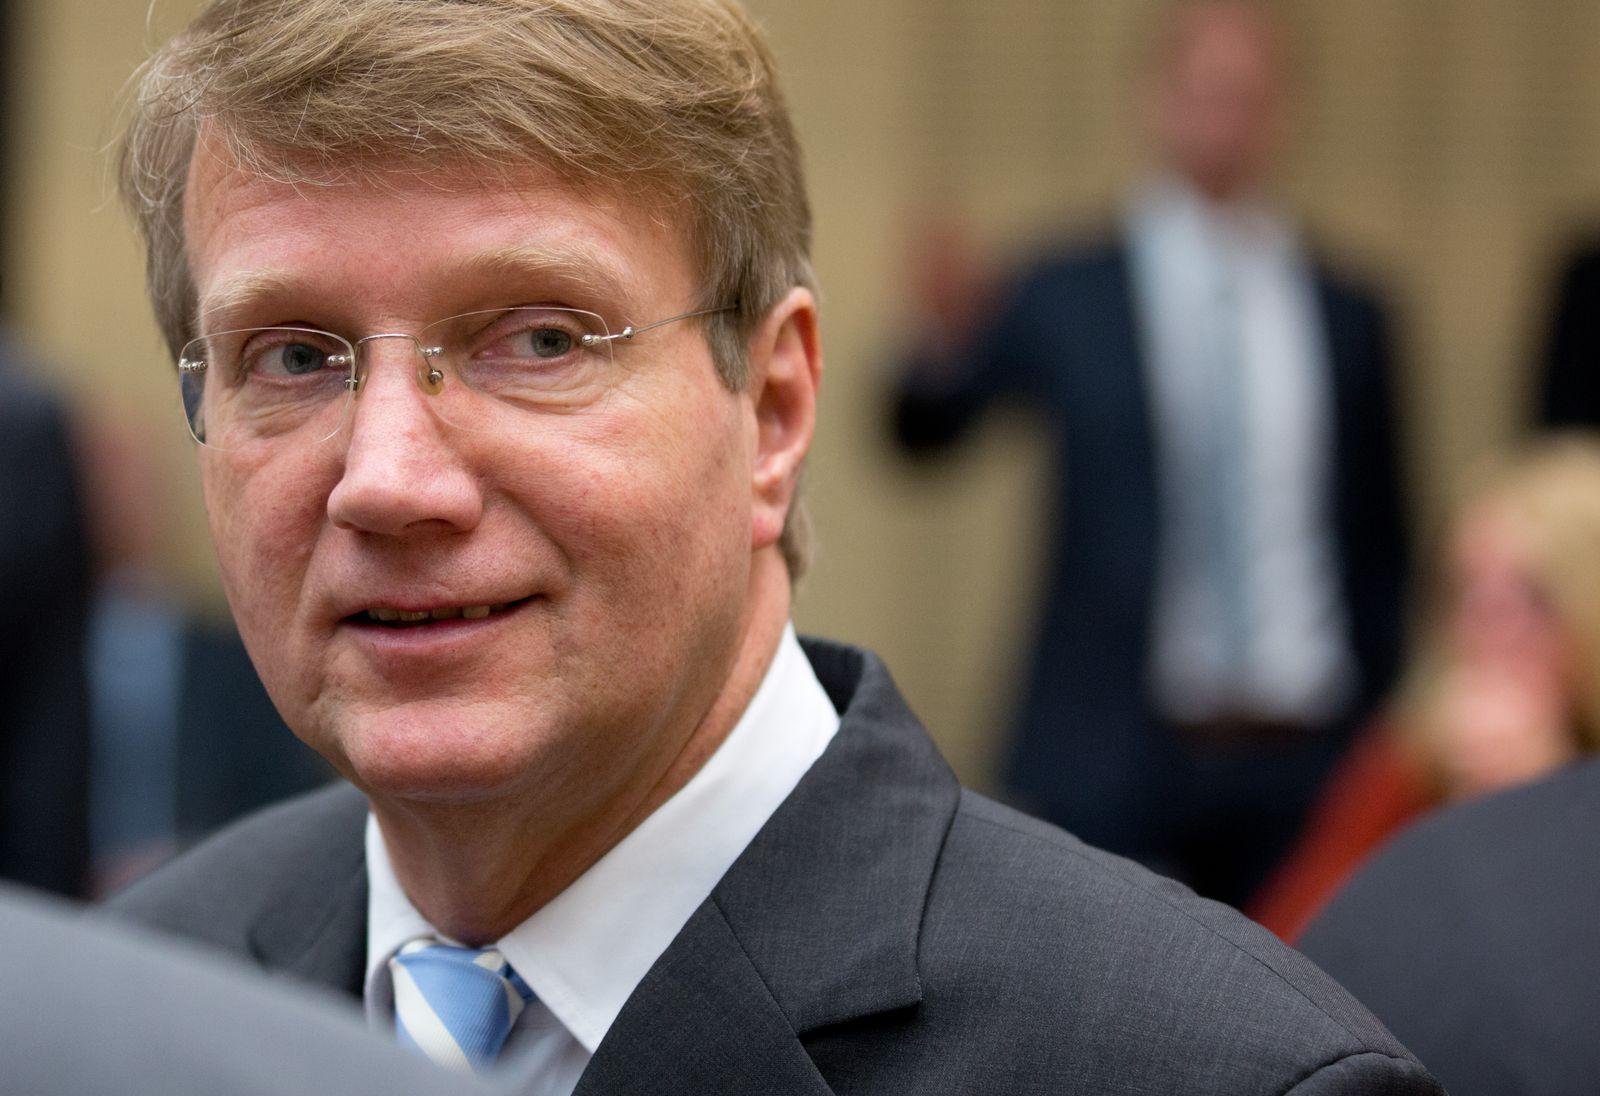 Ronald Pofalla/ CDU